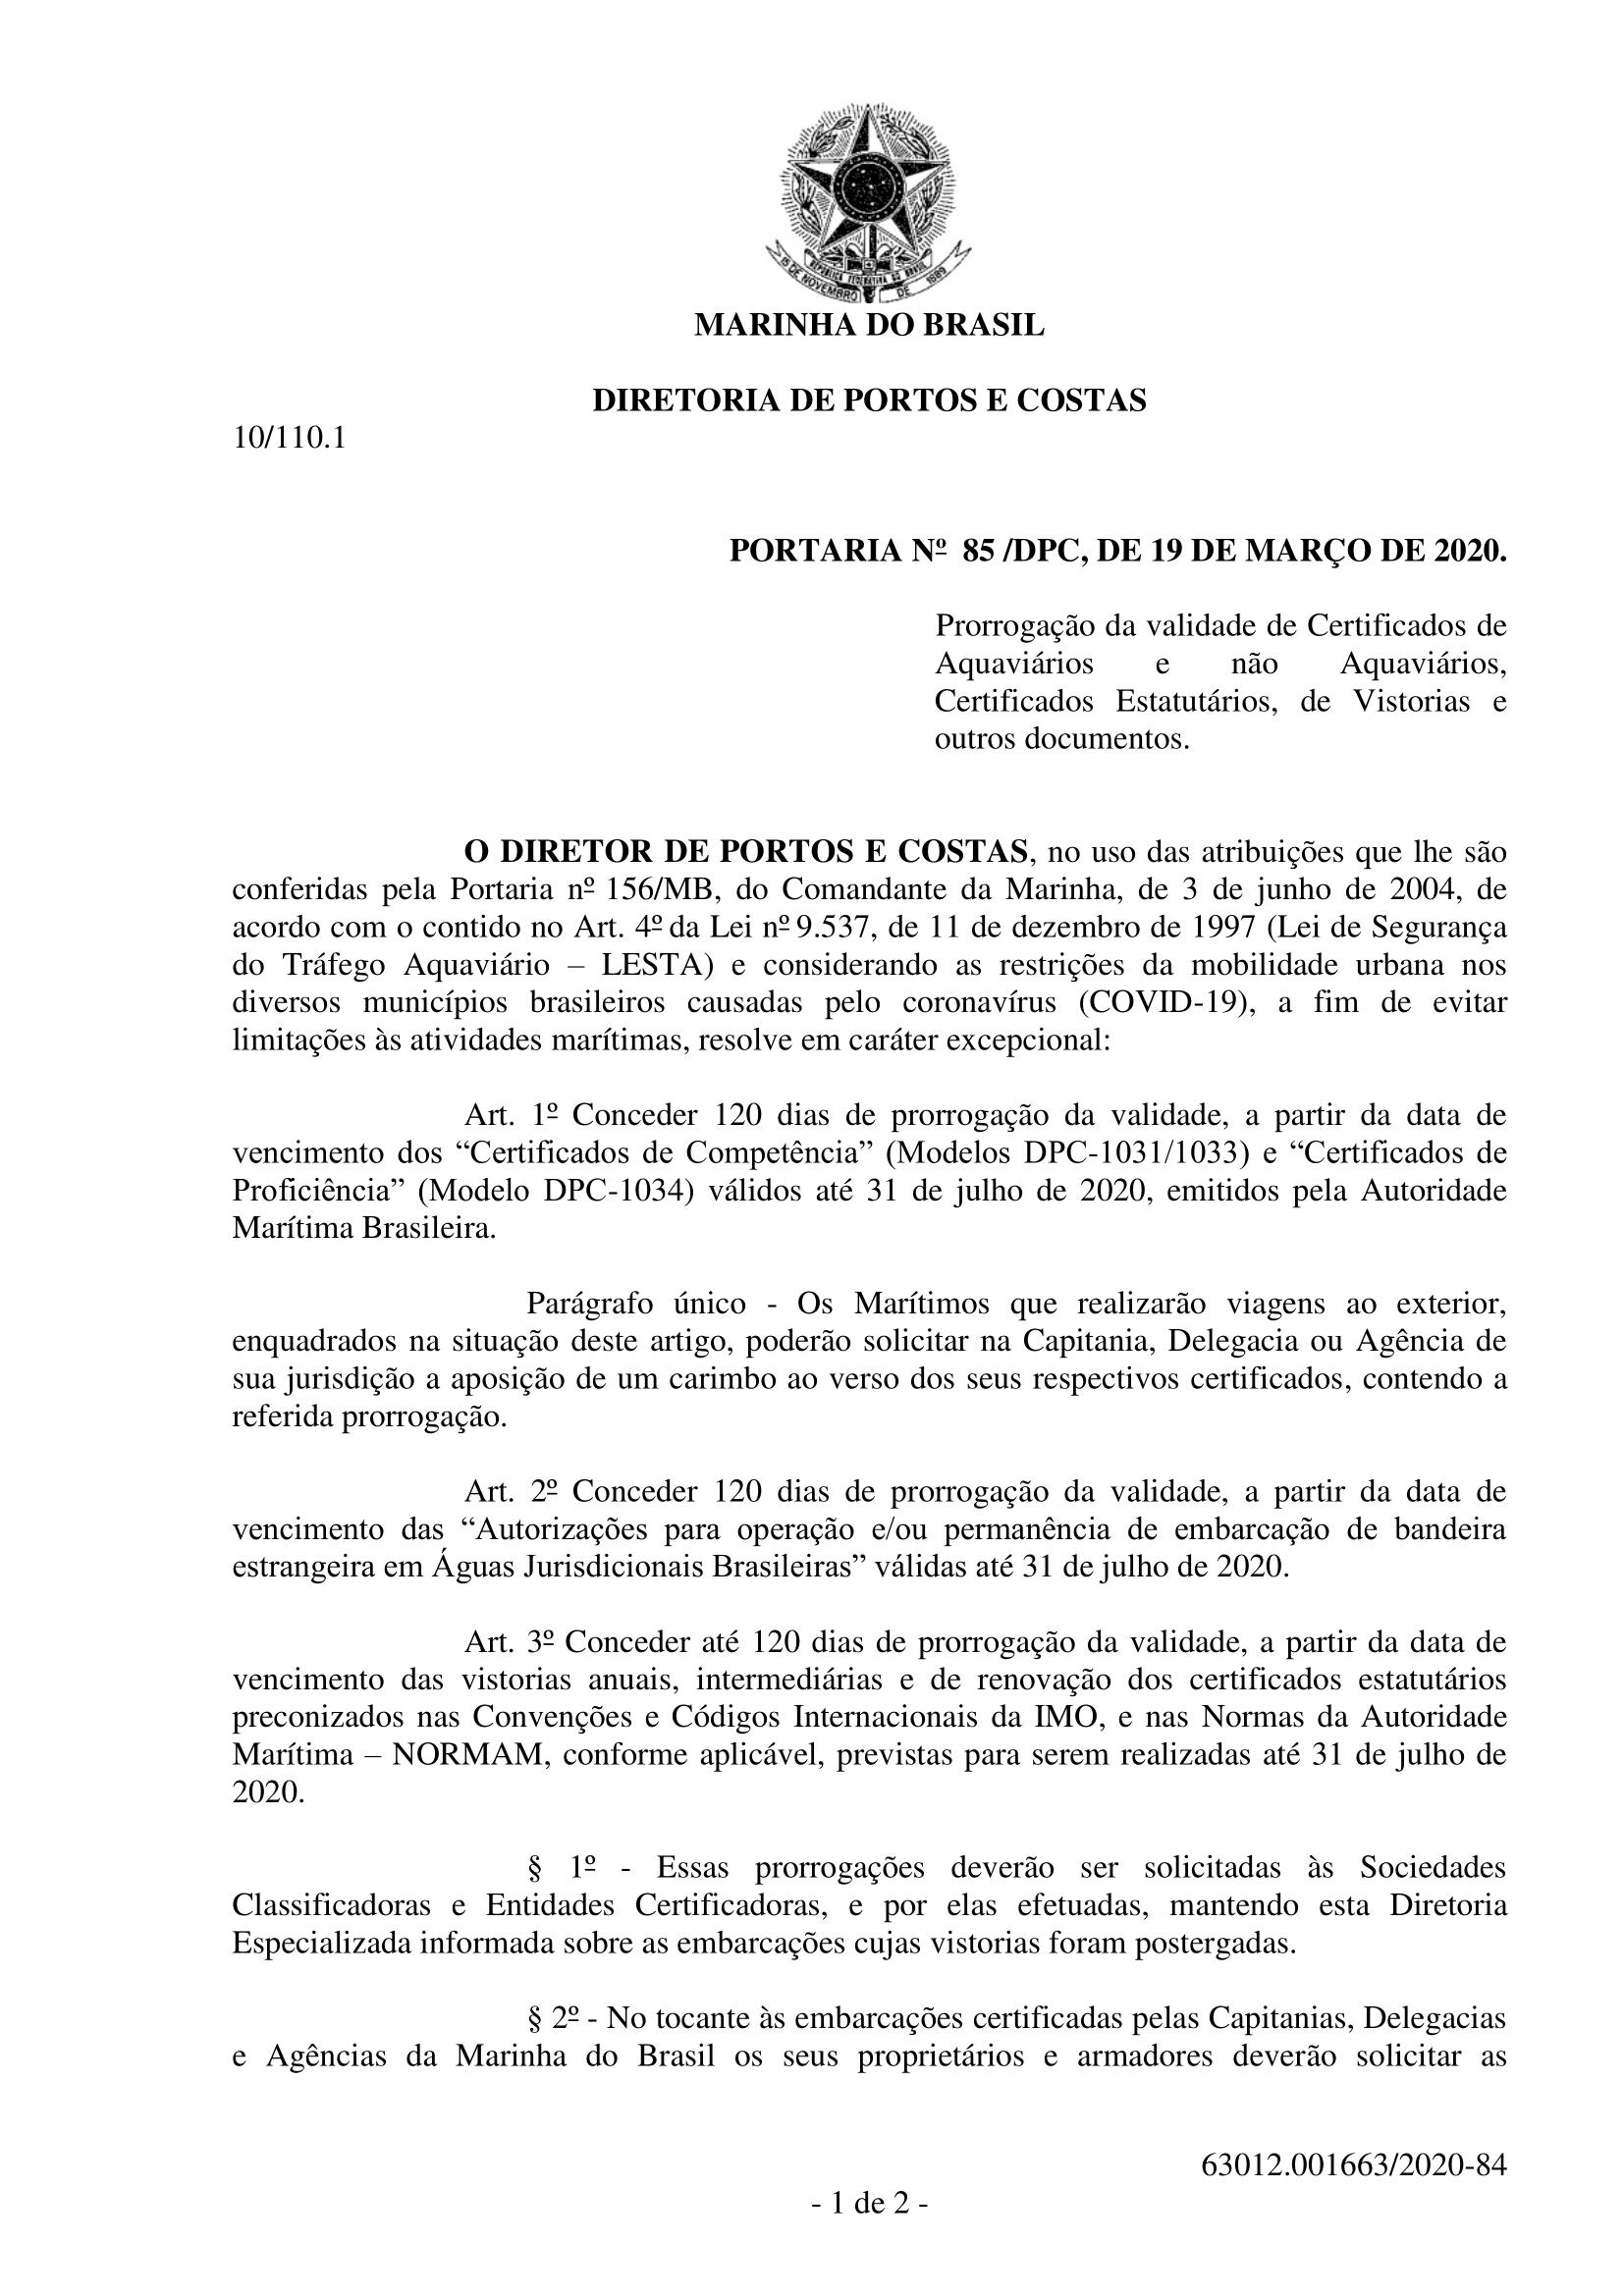 Port-85-2020-DPC-Prorrogacao-1010.1-1